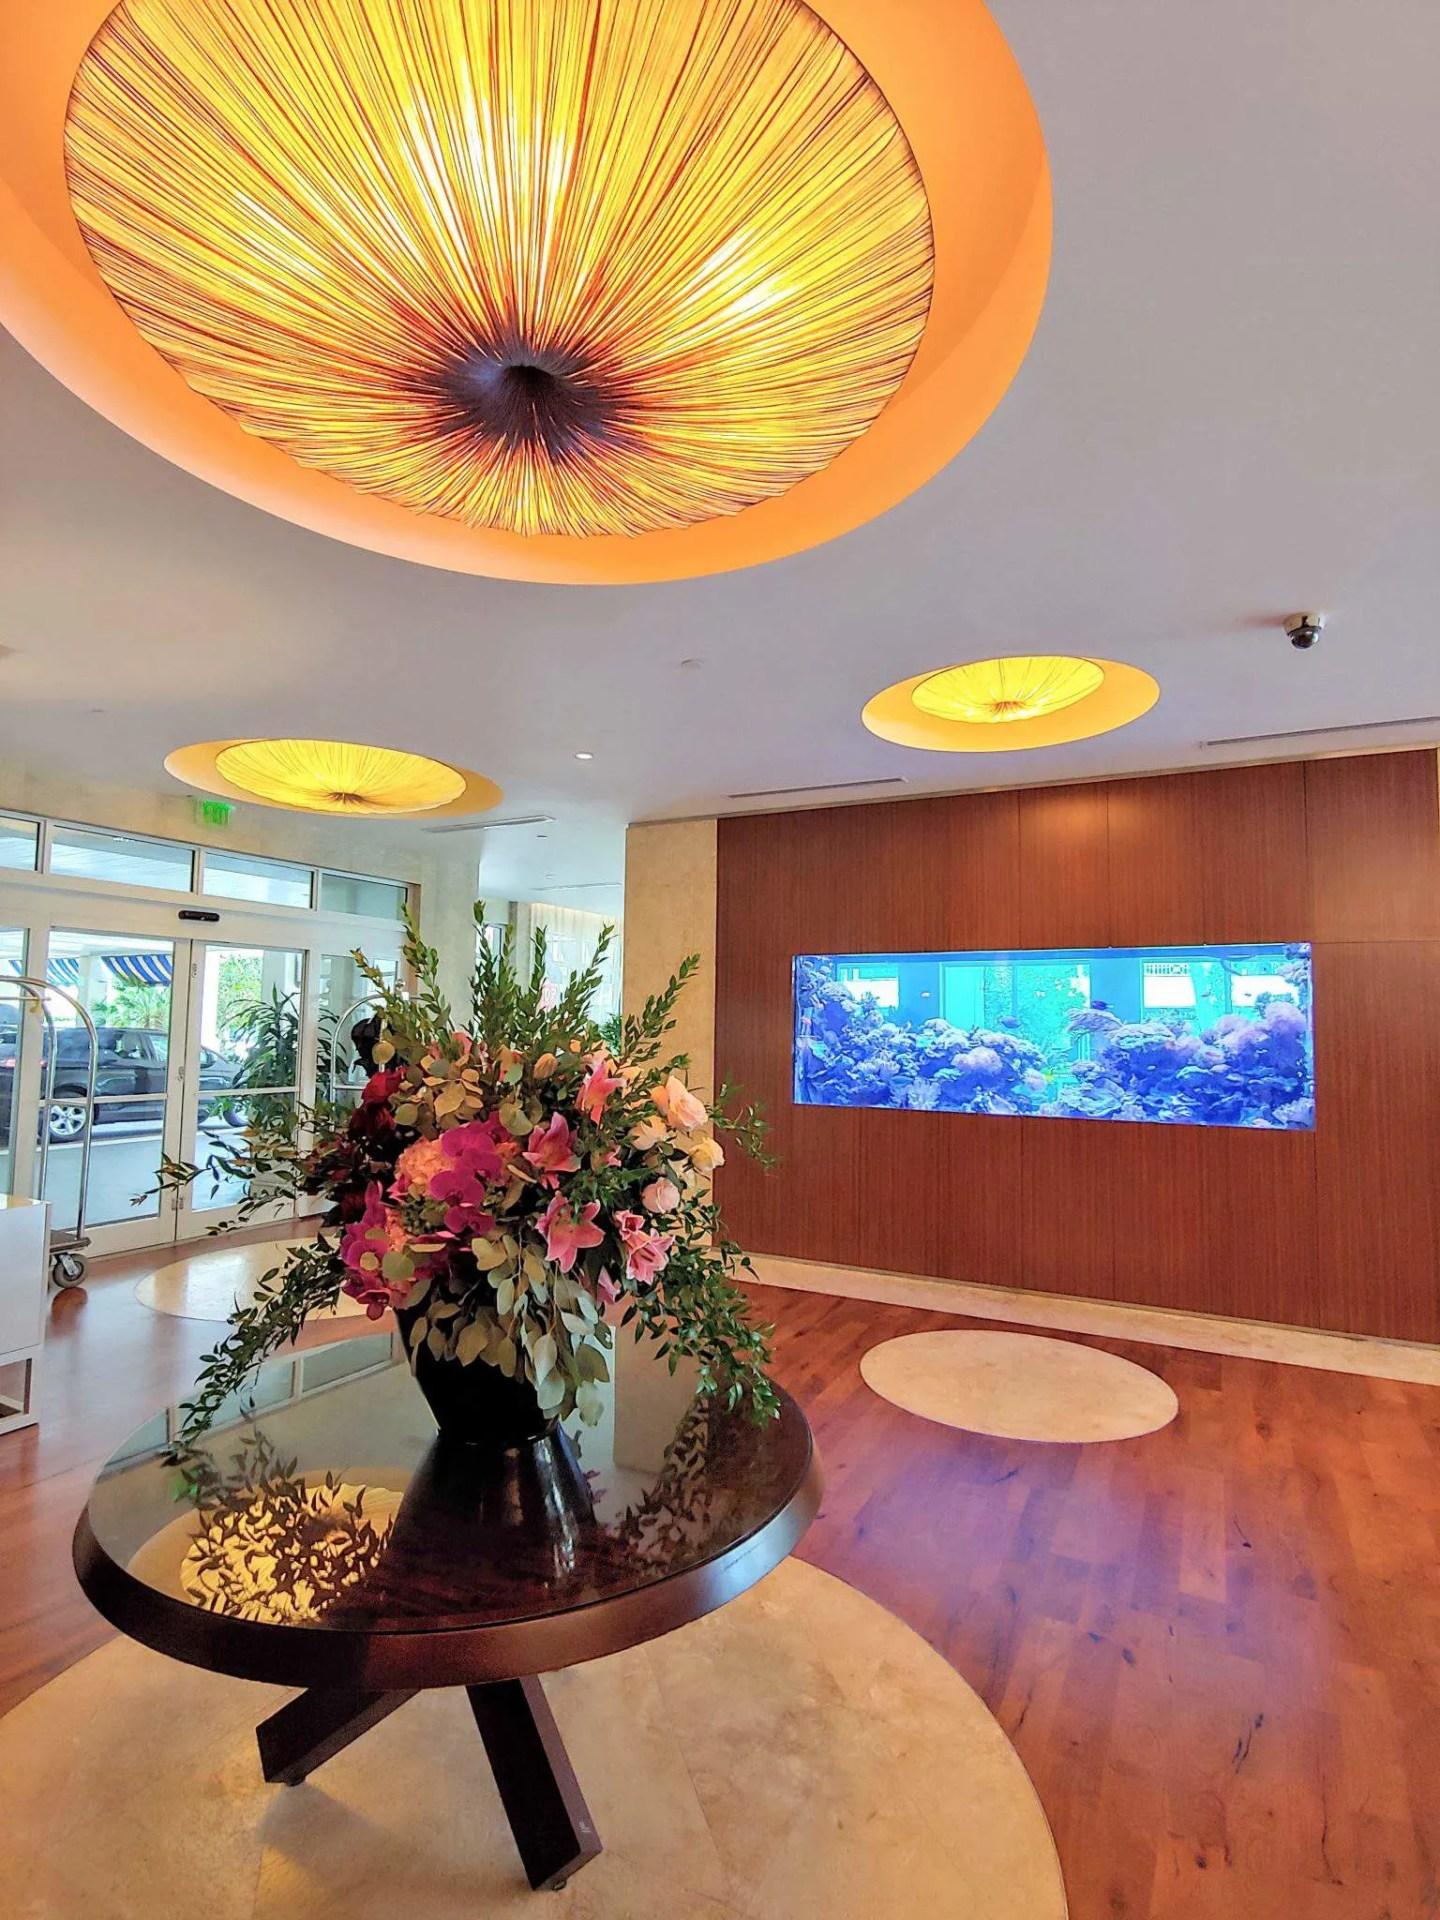 Lobby entrance with fish tank